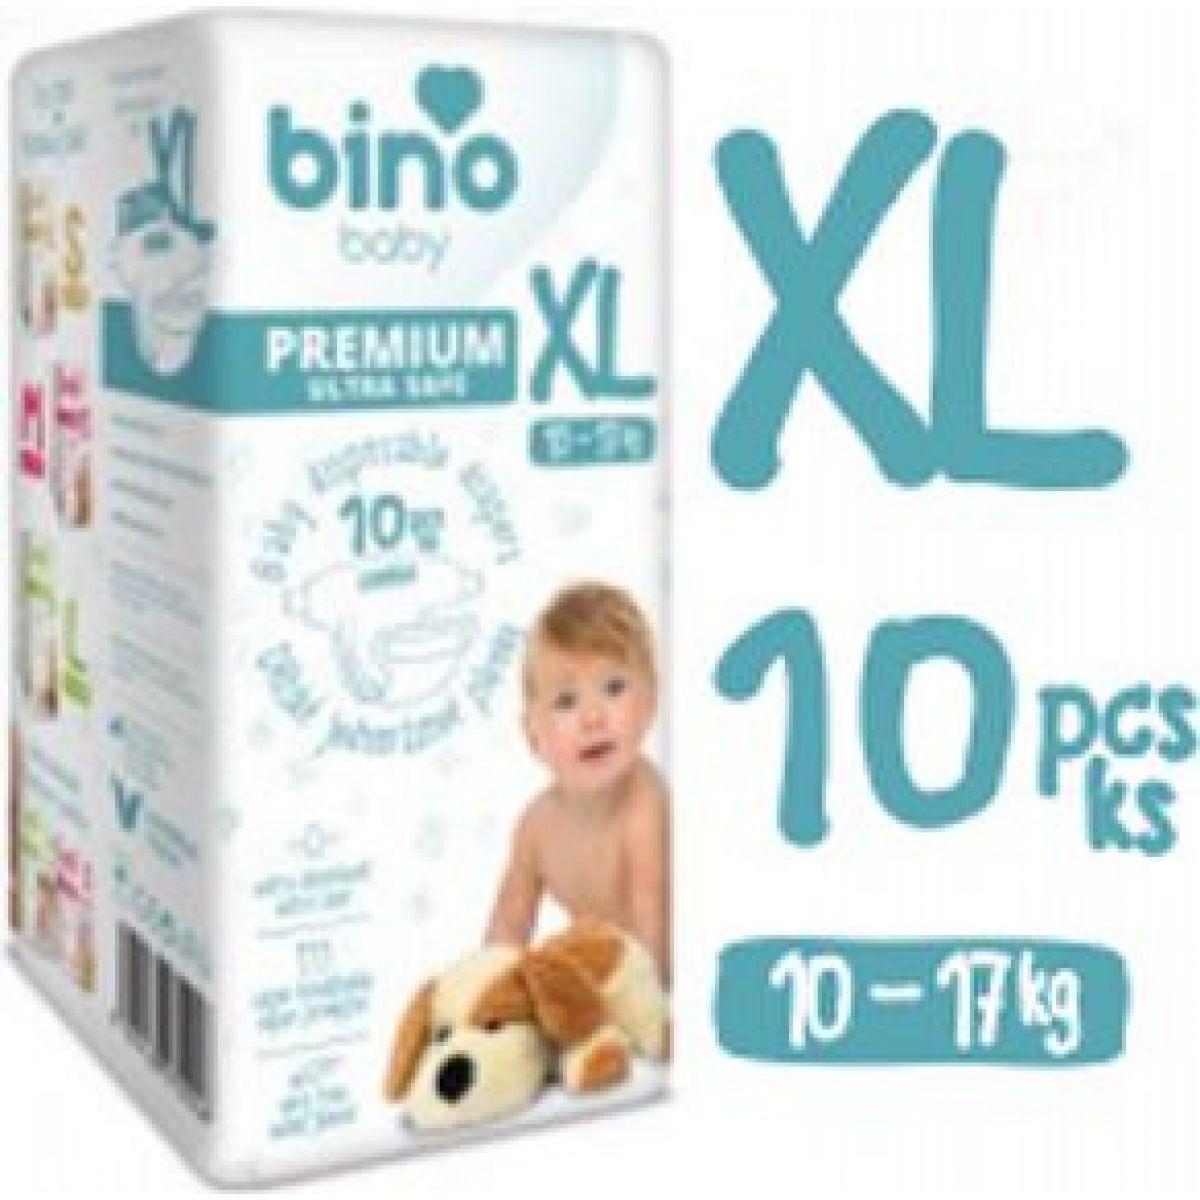 Bino Baby Premium Plienky veľ. XL 10-17kg 6x10 ks s darčekom